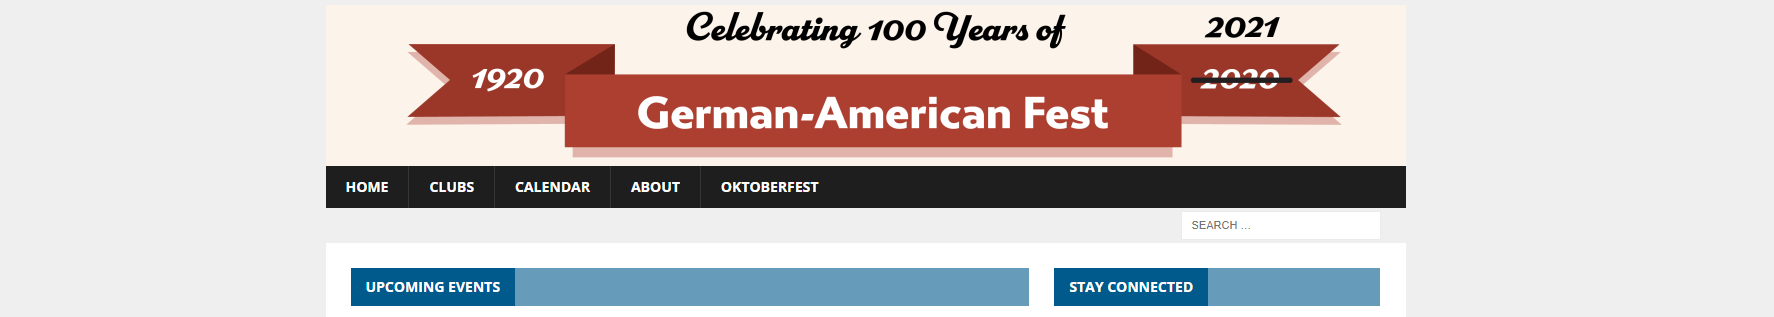 German-American Fest